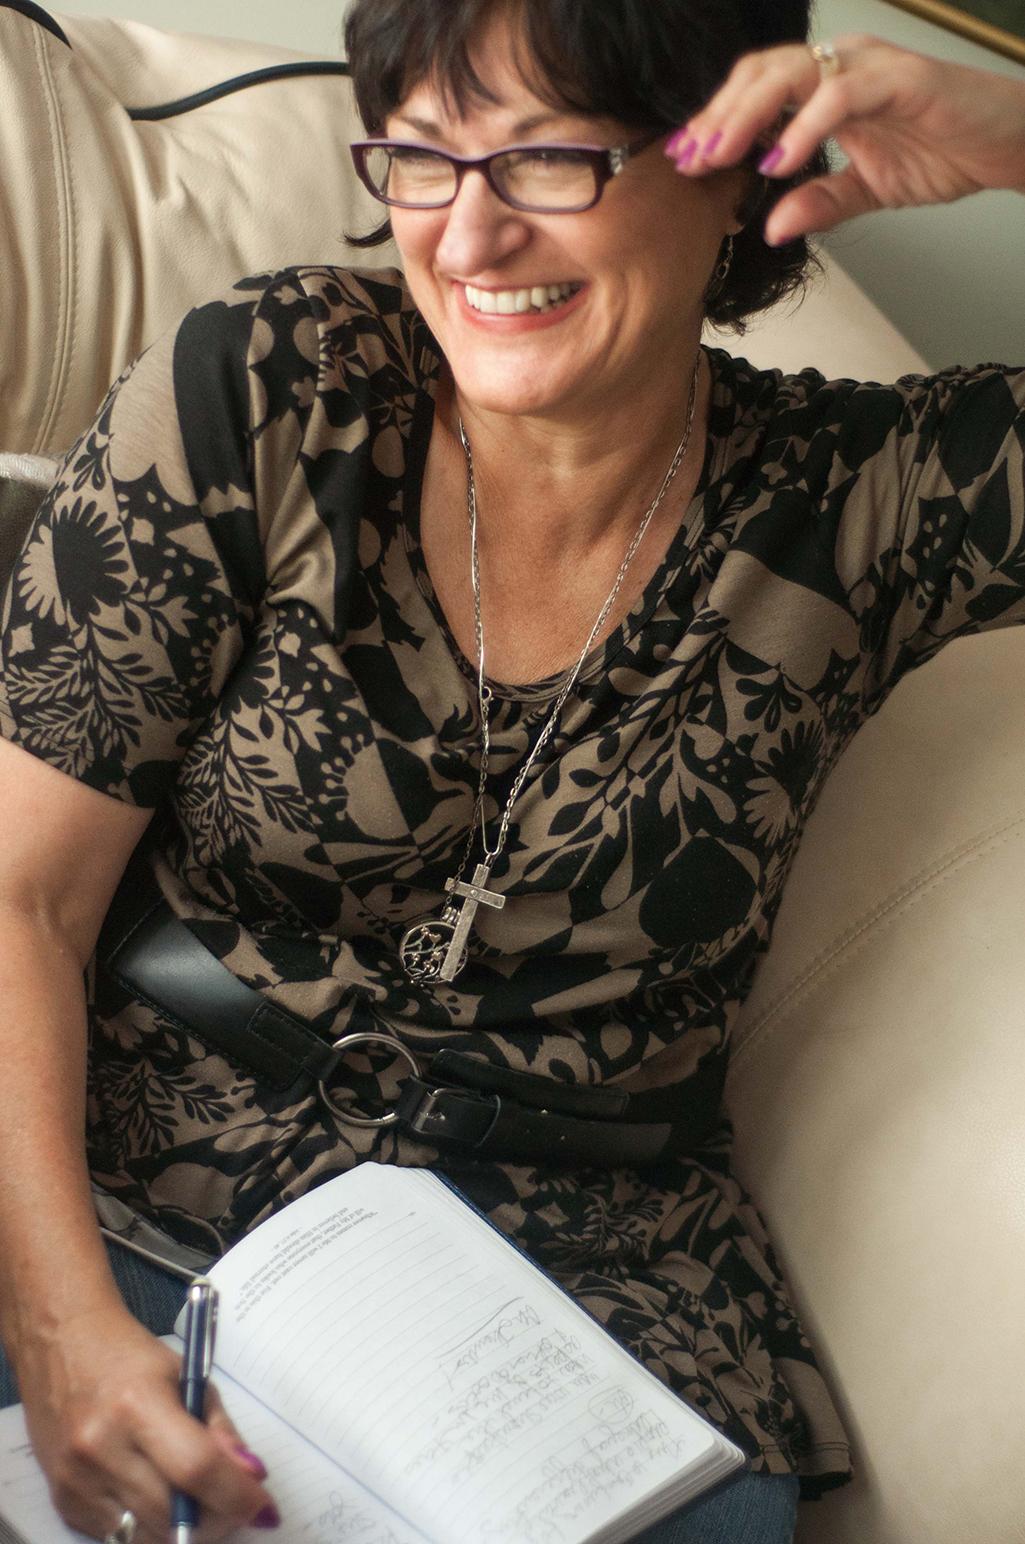 Dr. Patty Sadallah - Q&A